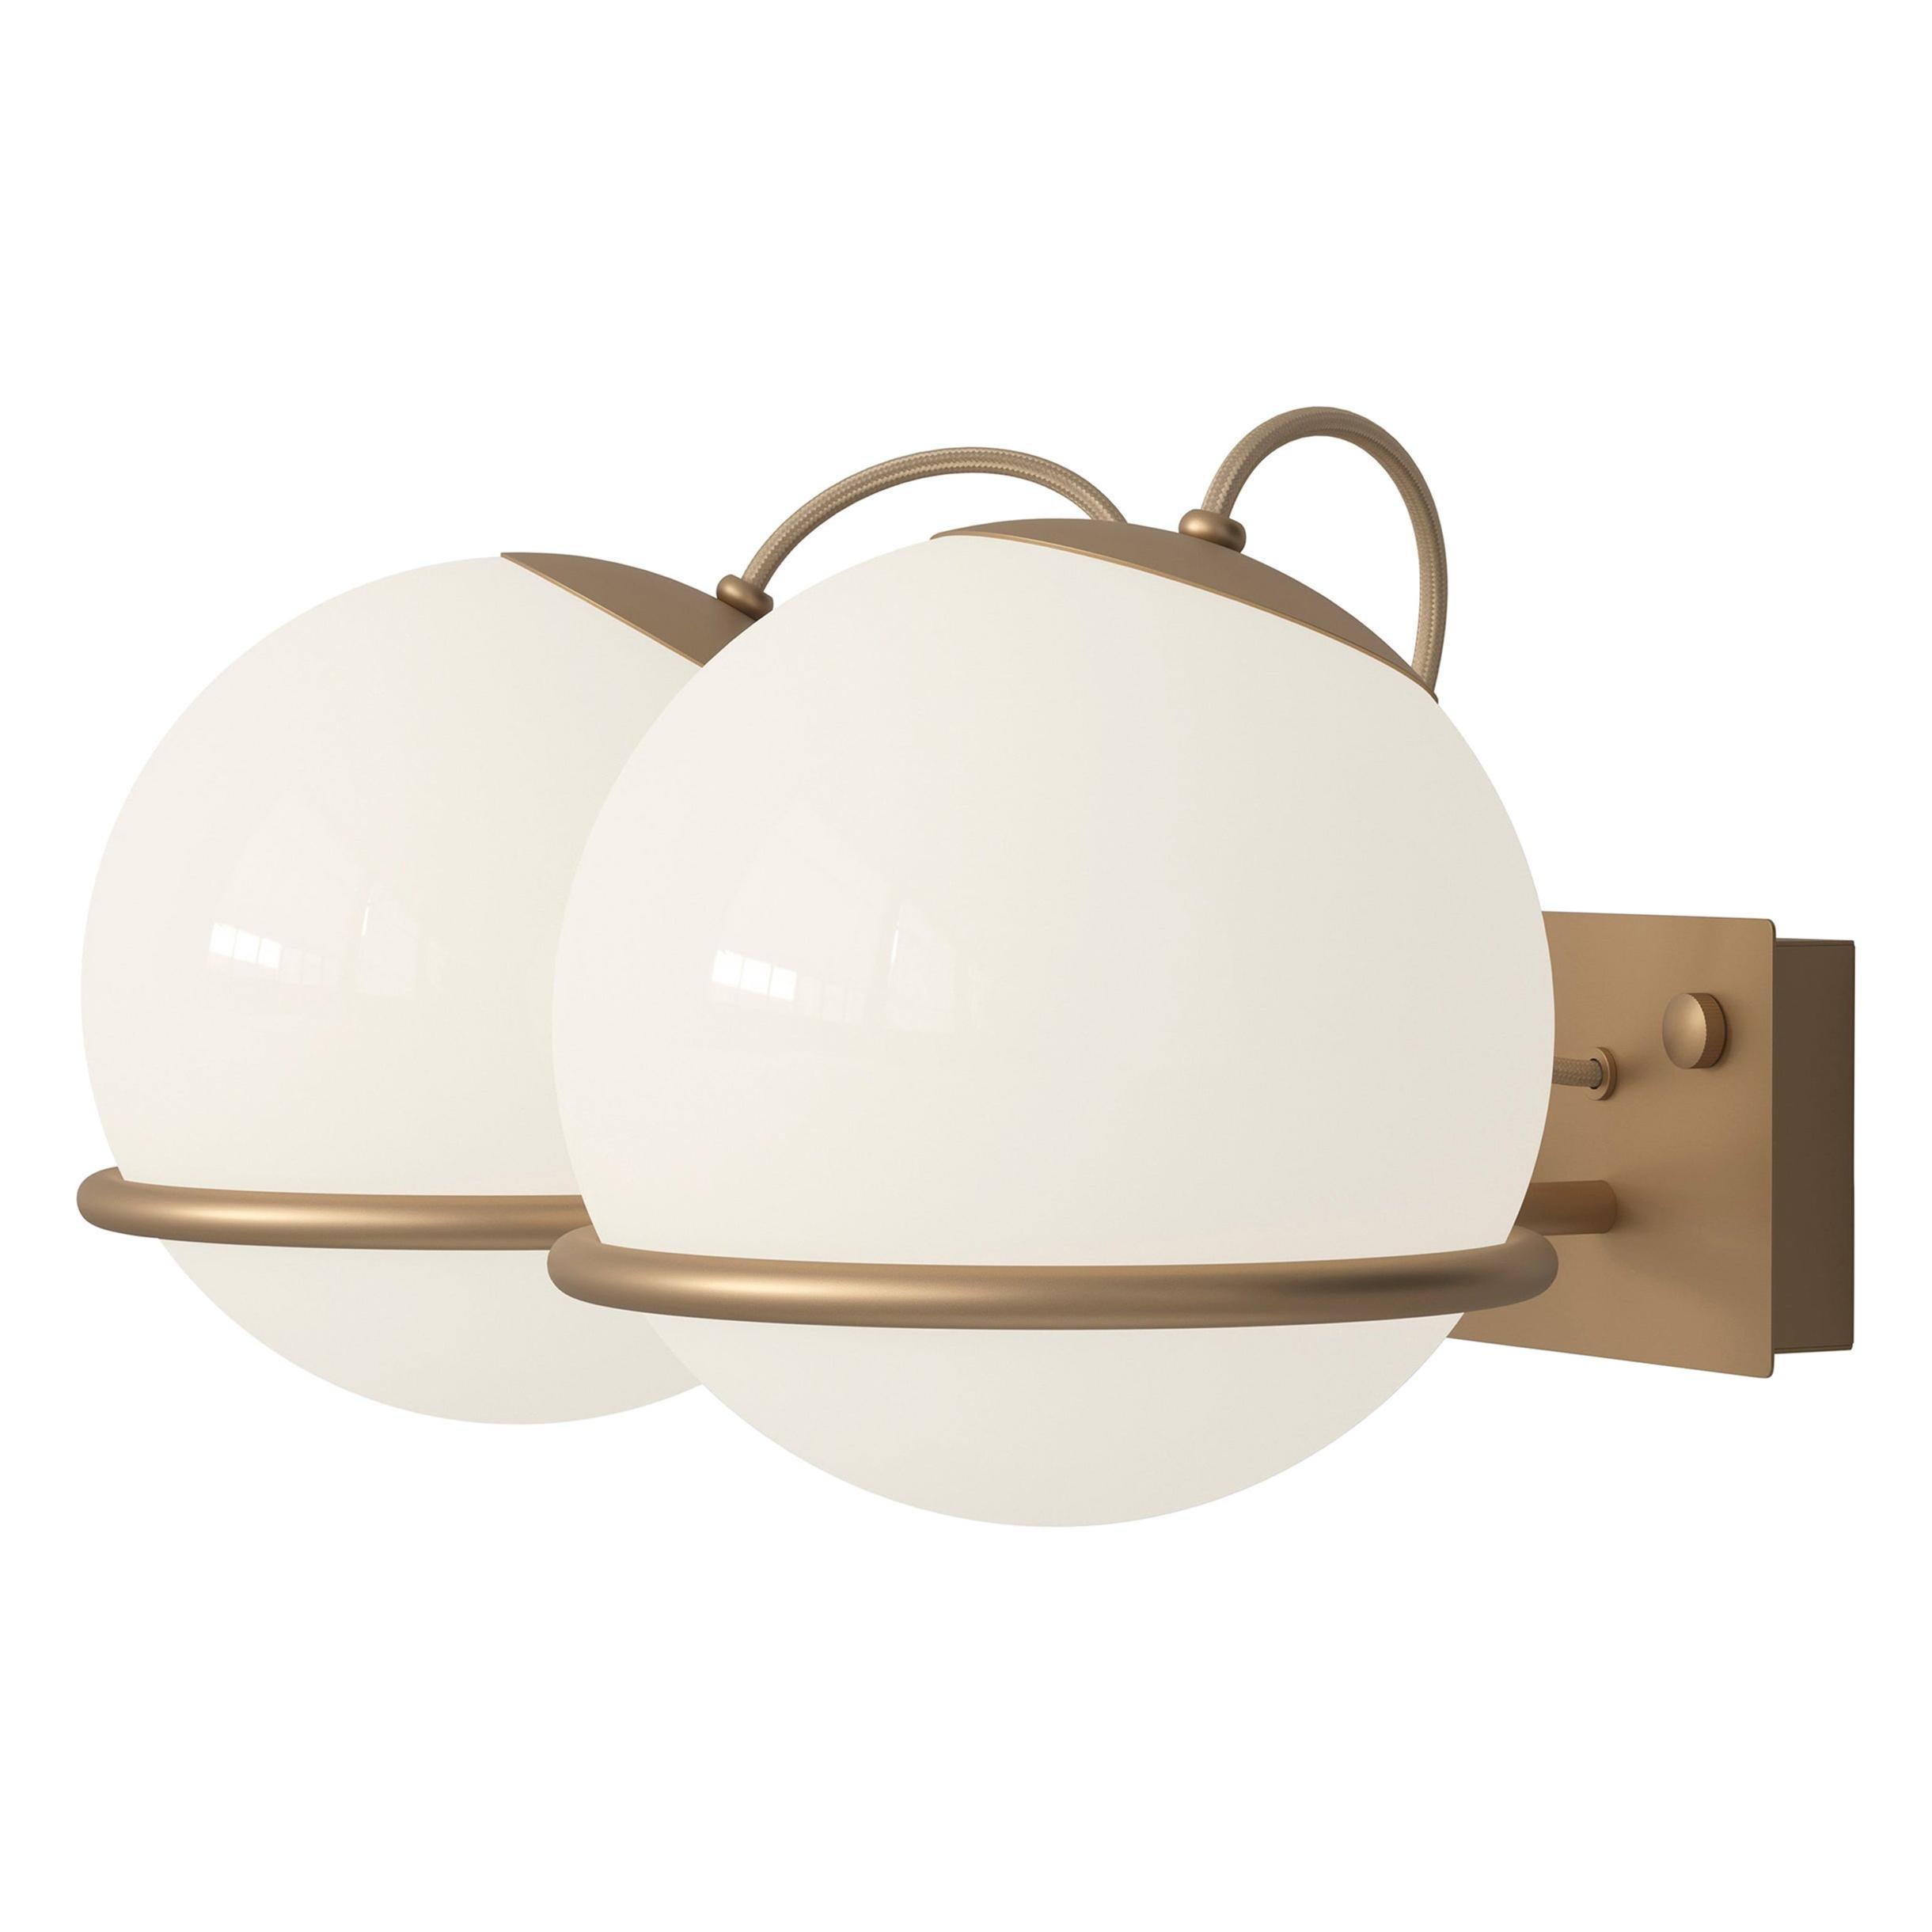 Gino Sarfatti Model 238/2 Wall Lamp